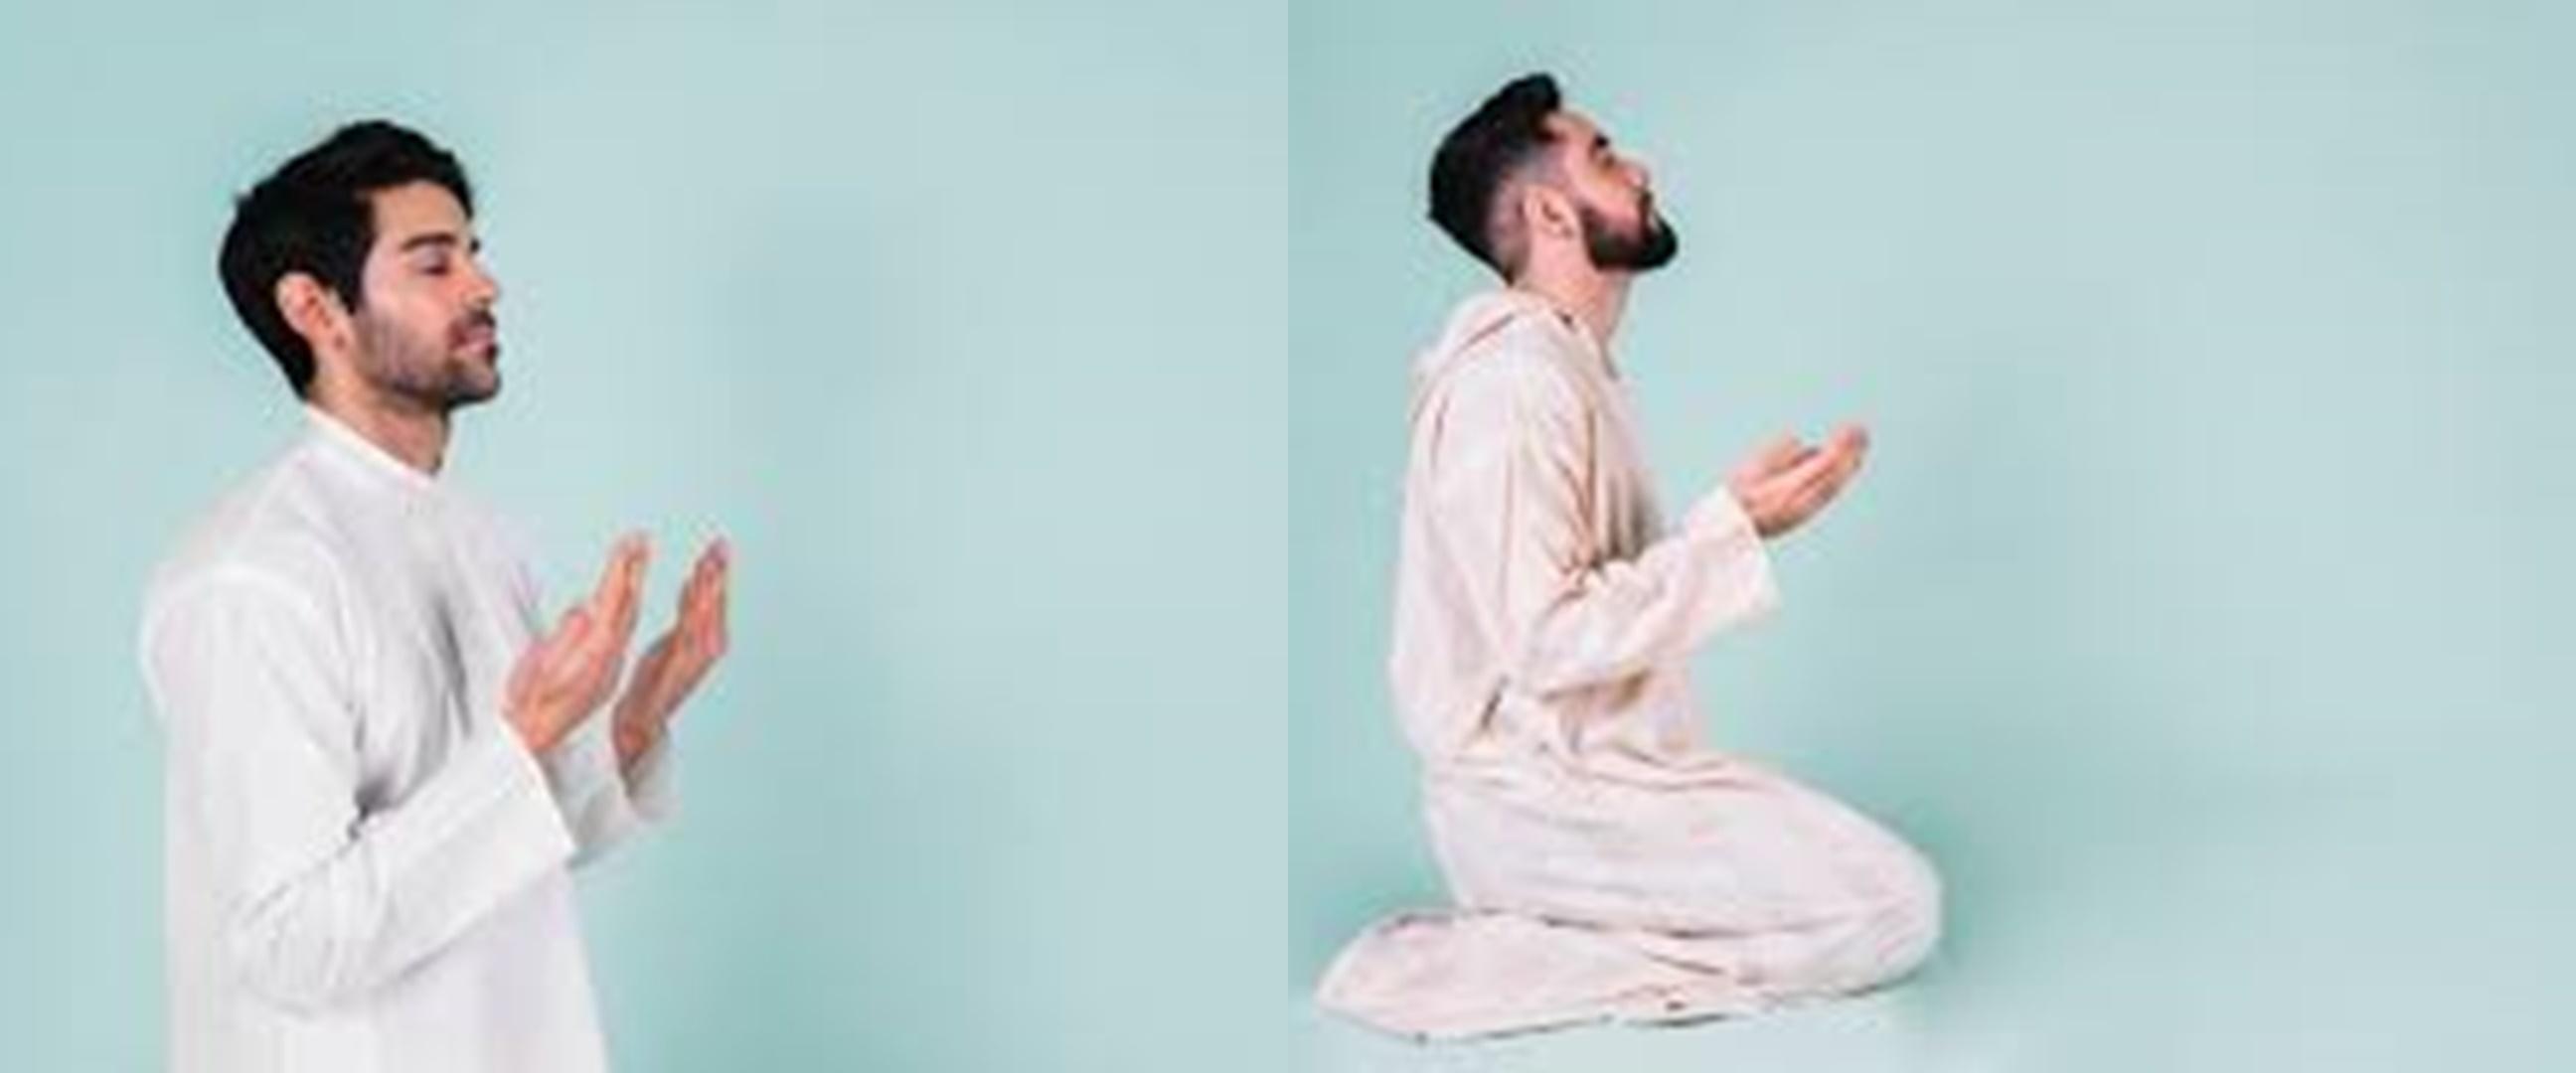 Arti Tawasul beserta bacaan dan praktiknya dalam Islam